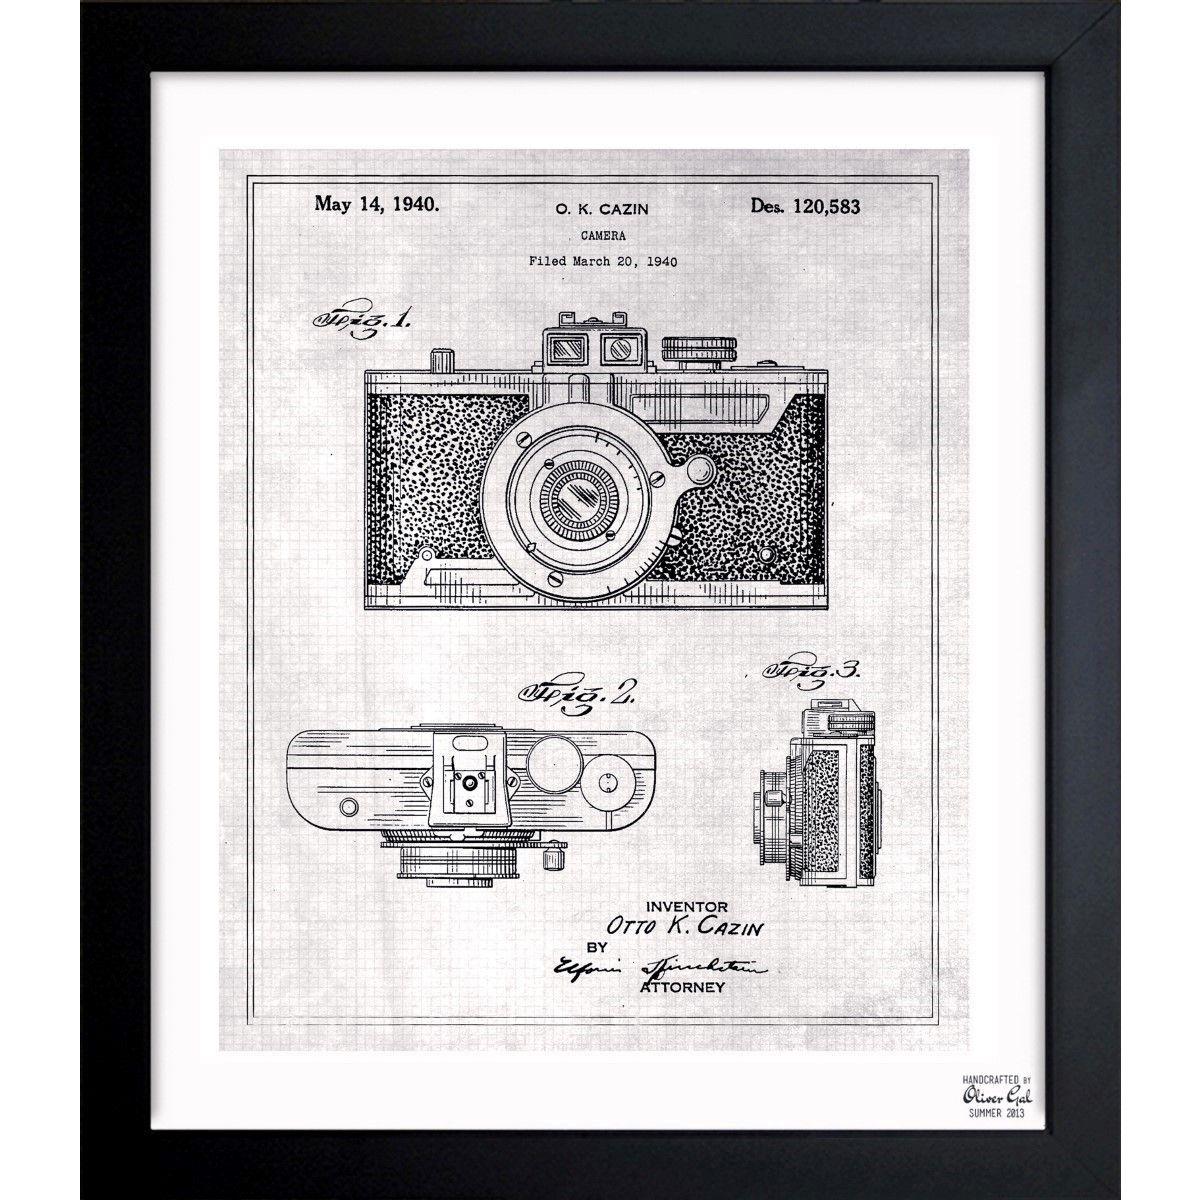 Oliver gal cazin camera 1940 grey framed blueprint art by oliver oliver gal cazin camera 1940 grey framed blueprint art by oliver gal malvernweather Image collections